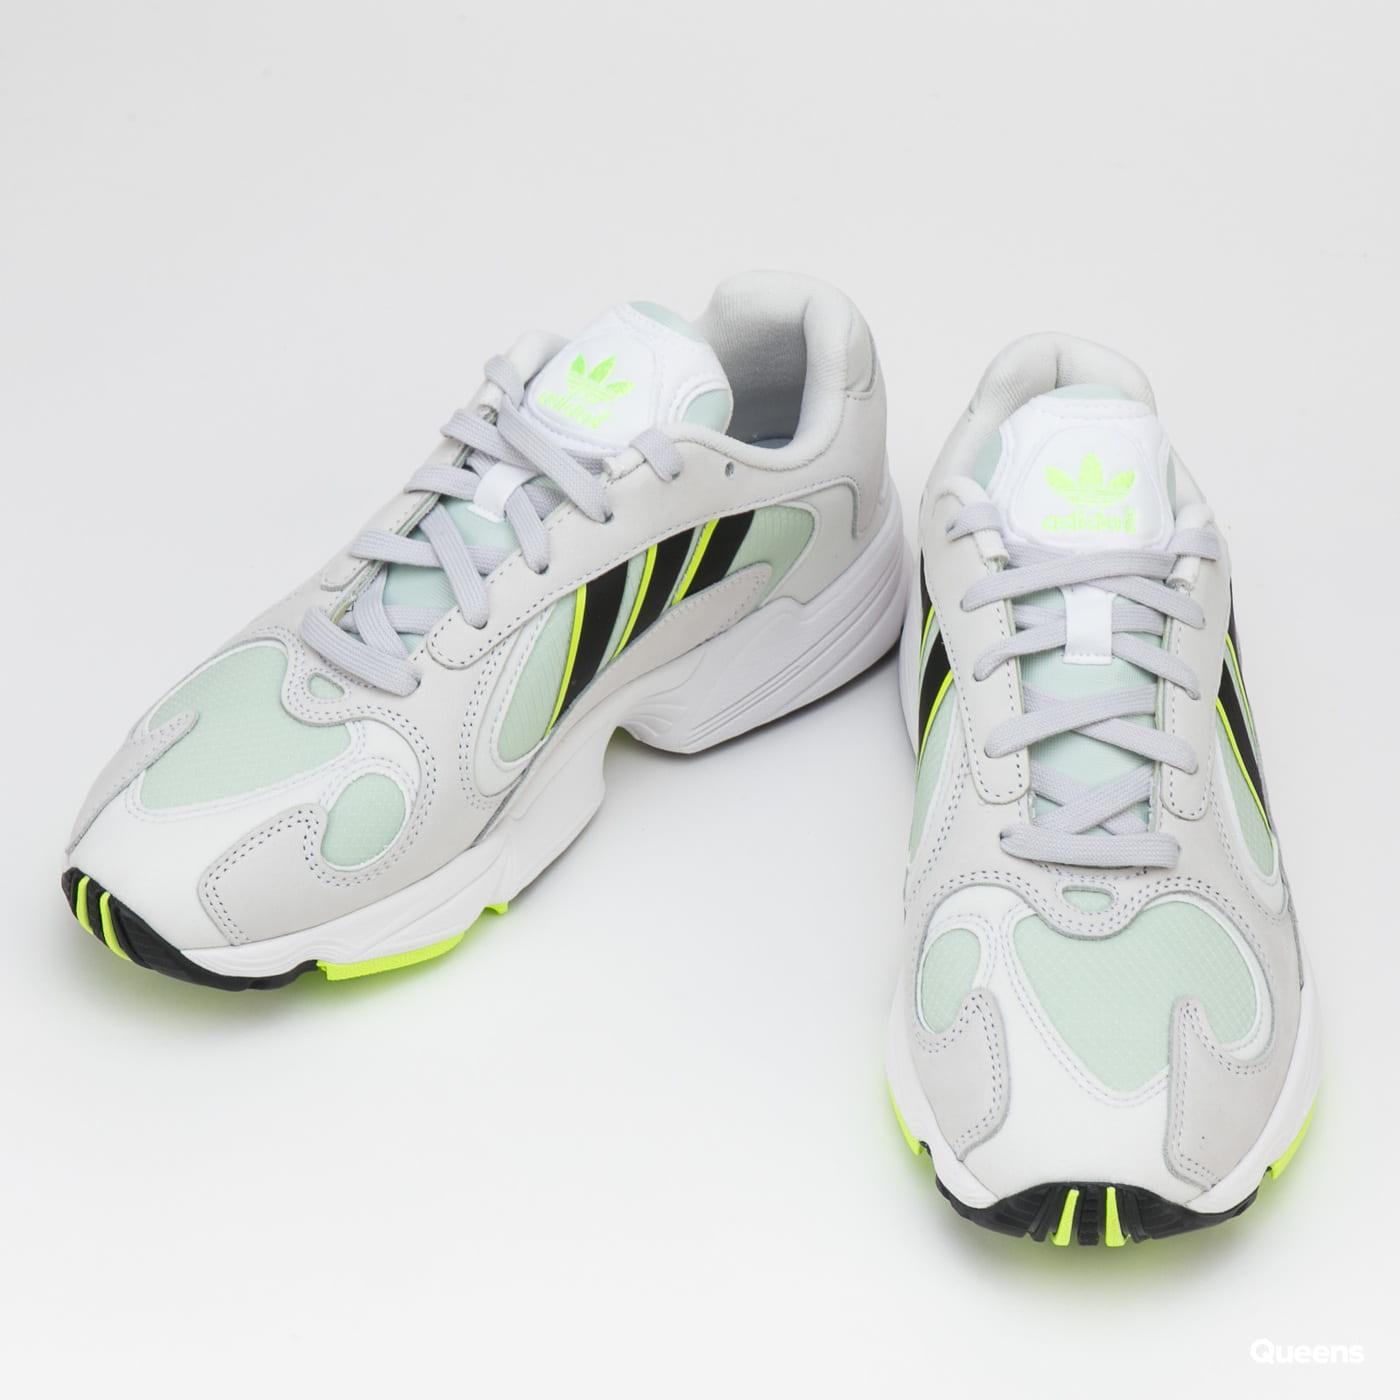 adidas Originals Yung-1 dshgrn / cblack / syello